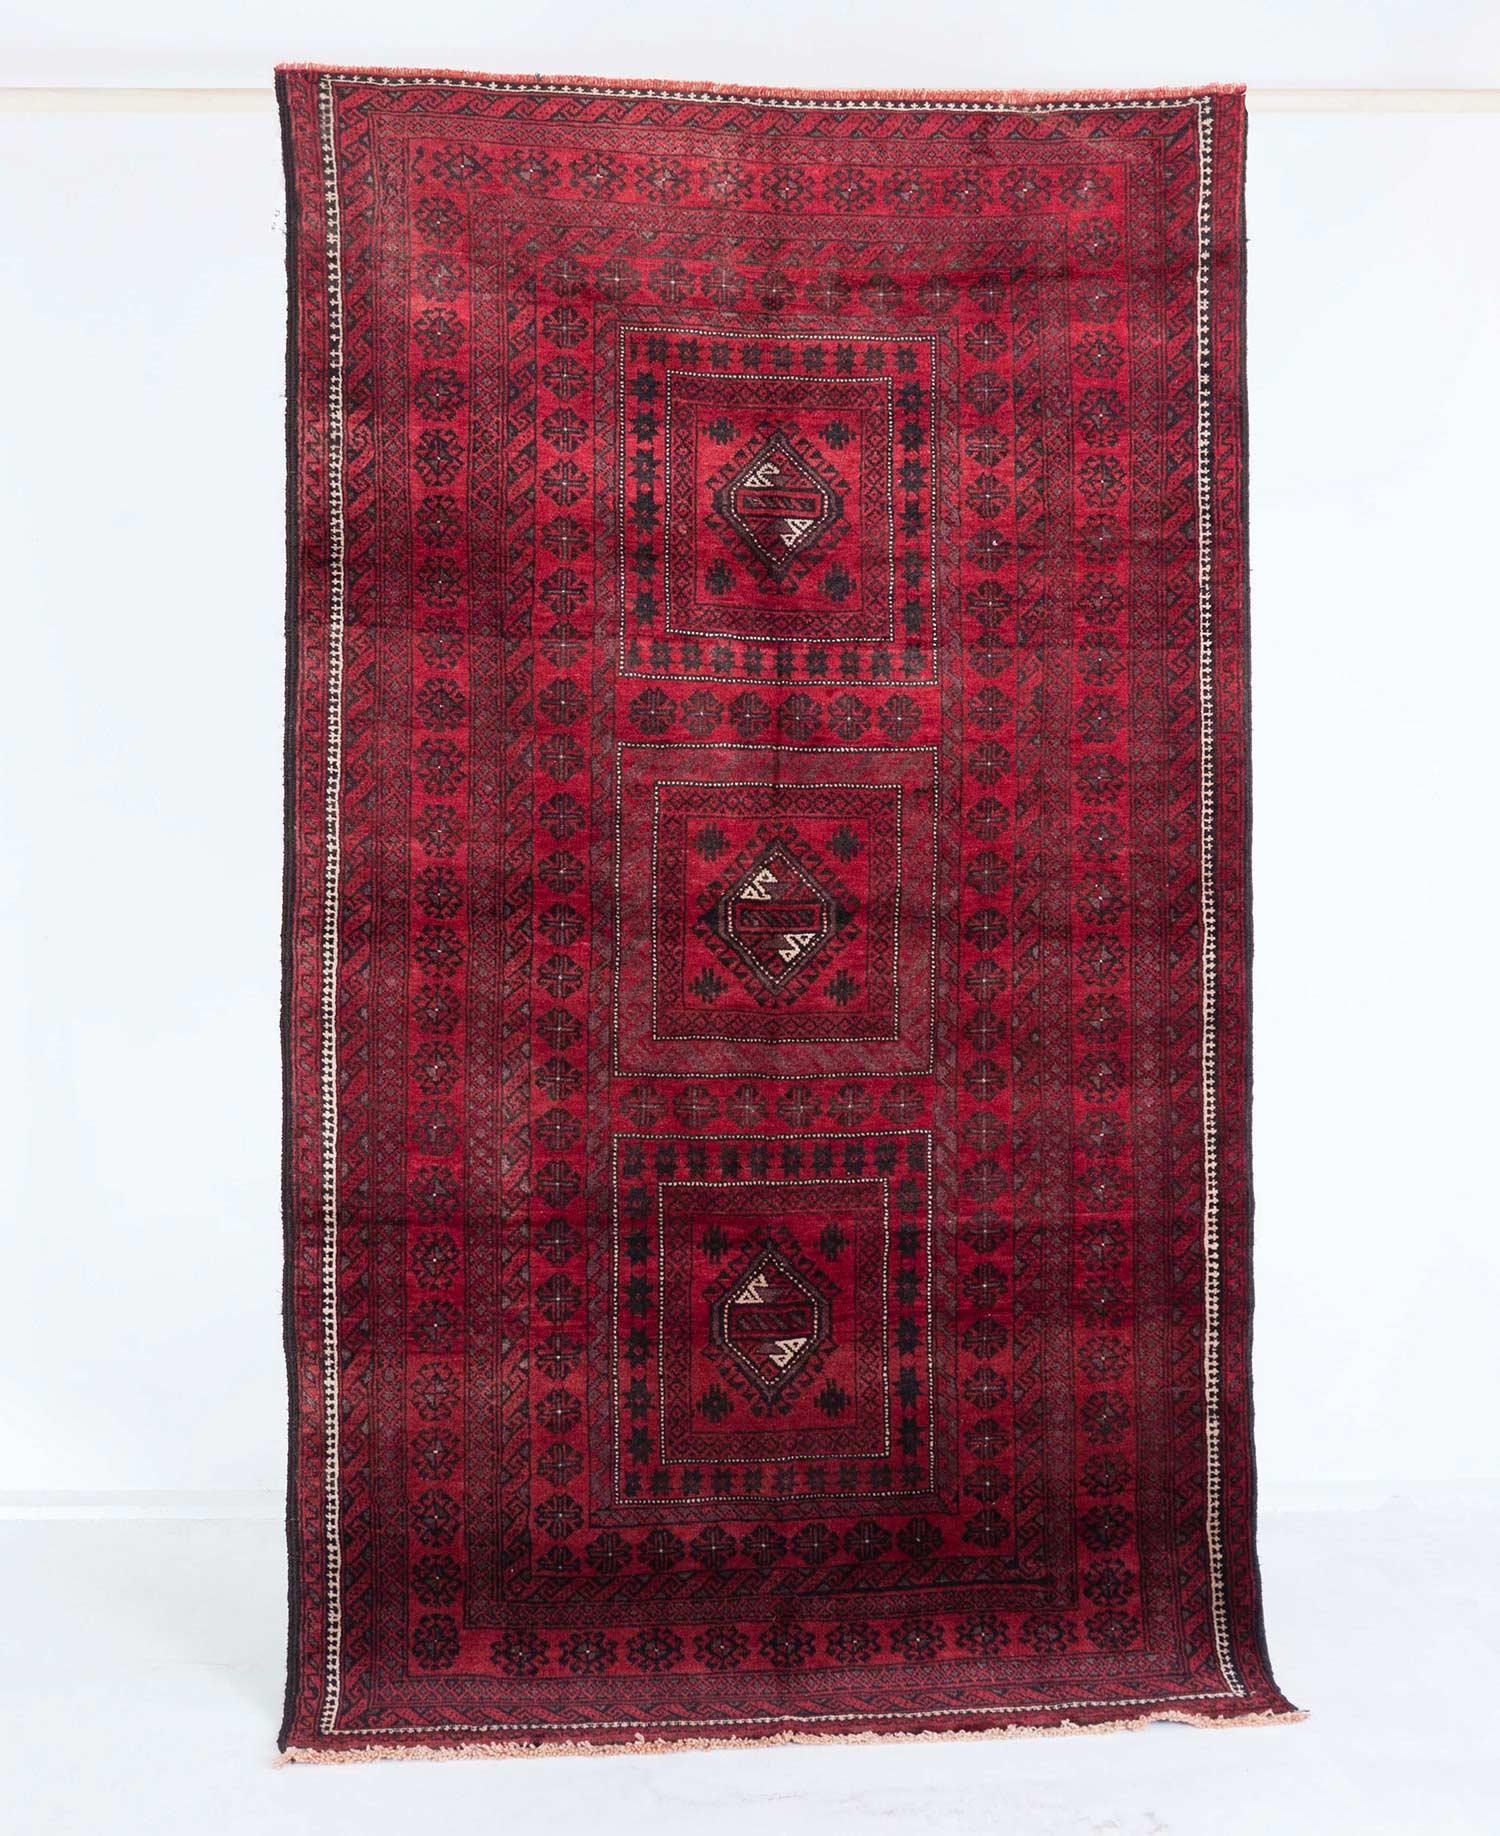 NO. 0092 /  PERSIAN (BALOUCH) / 70 YEARS /7'1 x 4'0 FT